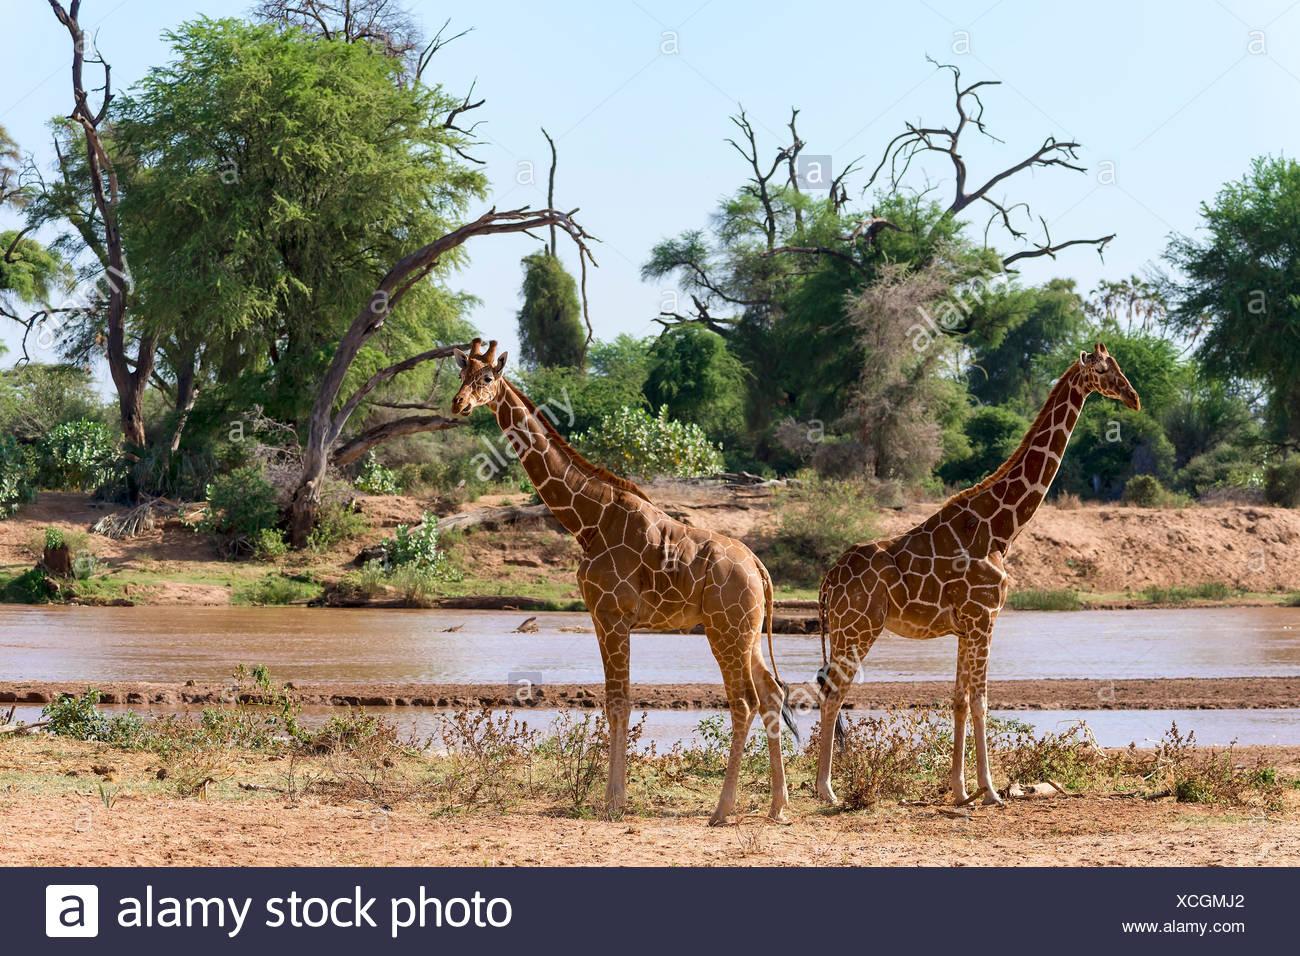 Giraffe réticulée ou Somali girafes (Giraffa camelopardalis reticulata) courir le long de la rivière, la réserve nationale de Samburu, Kenya Banque D'Images